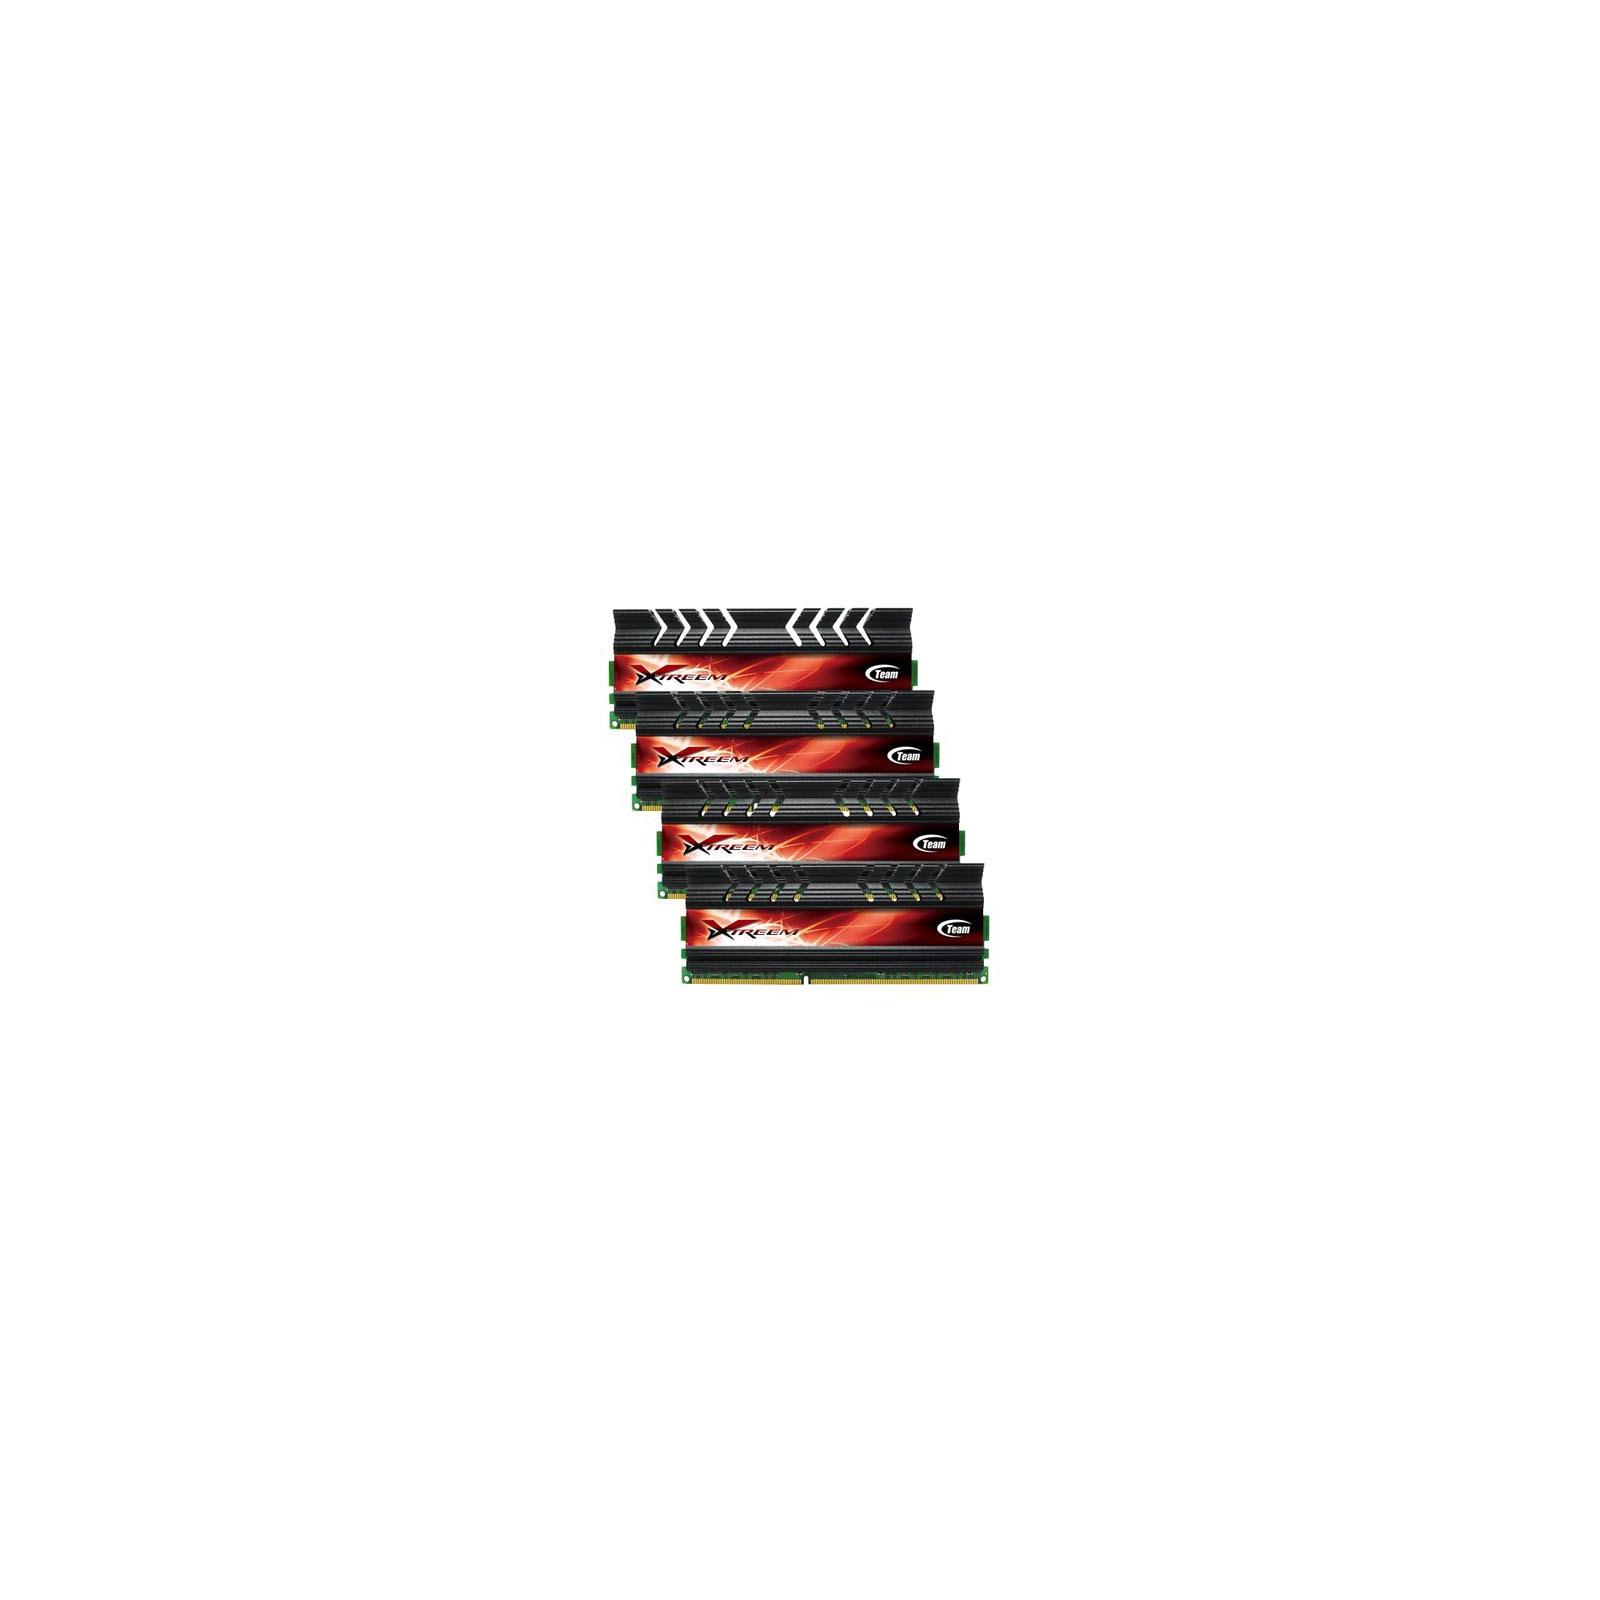 Модуль памяти для компьютера DDR3 32GB (4x8GB) 2133 MHz Team (TXD332G2133HC11QC01)